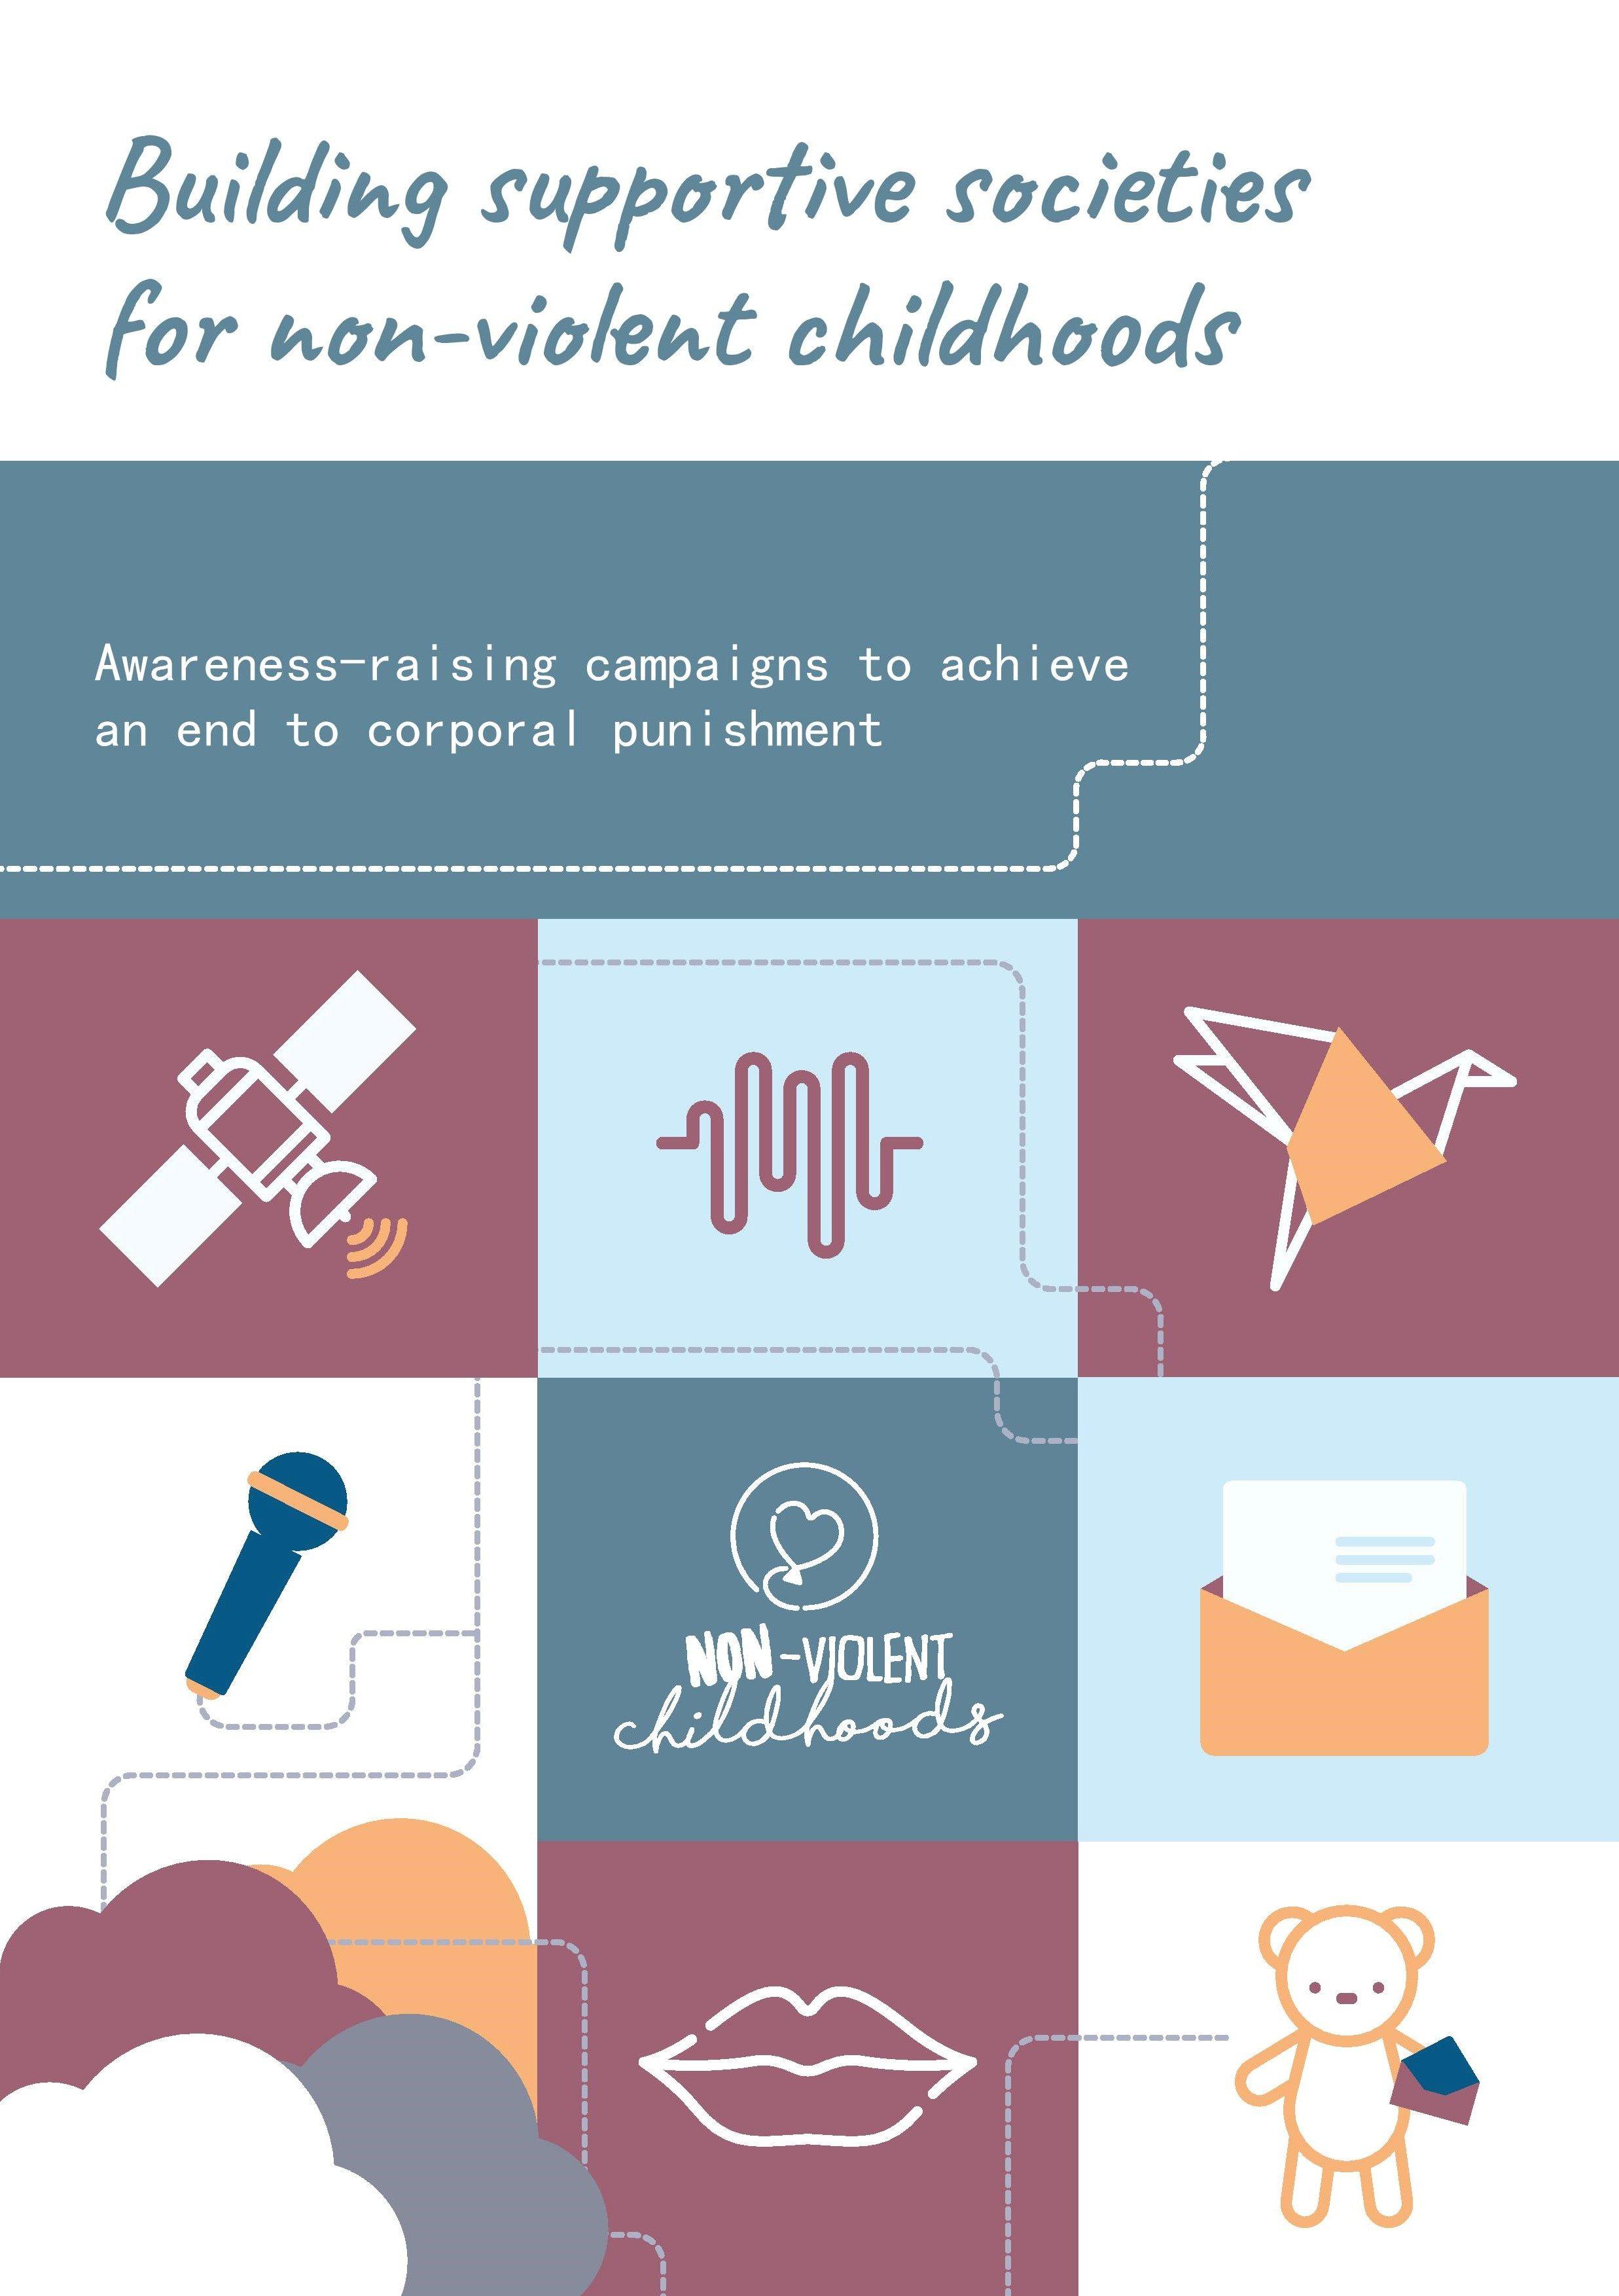 NVC_AwarenessRaising2018-cover